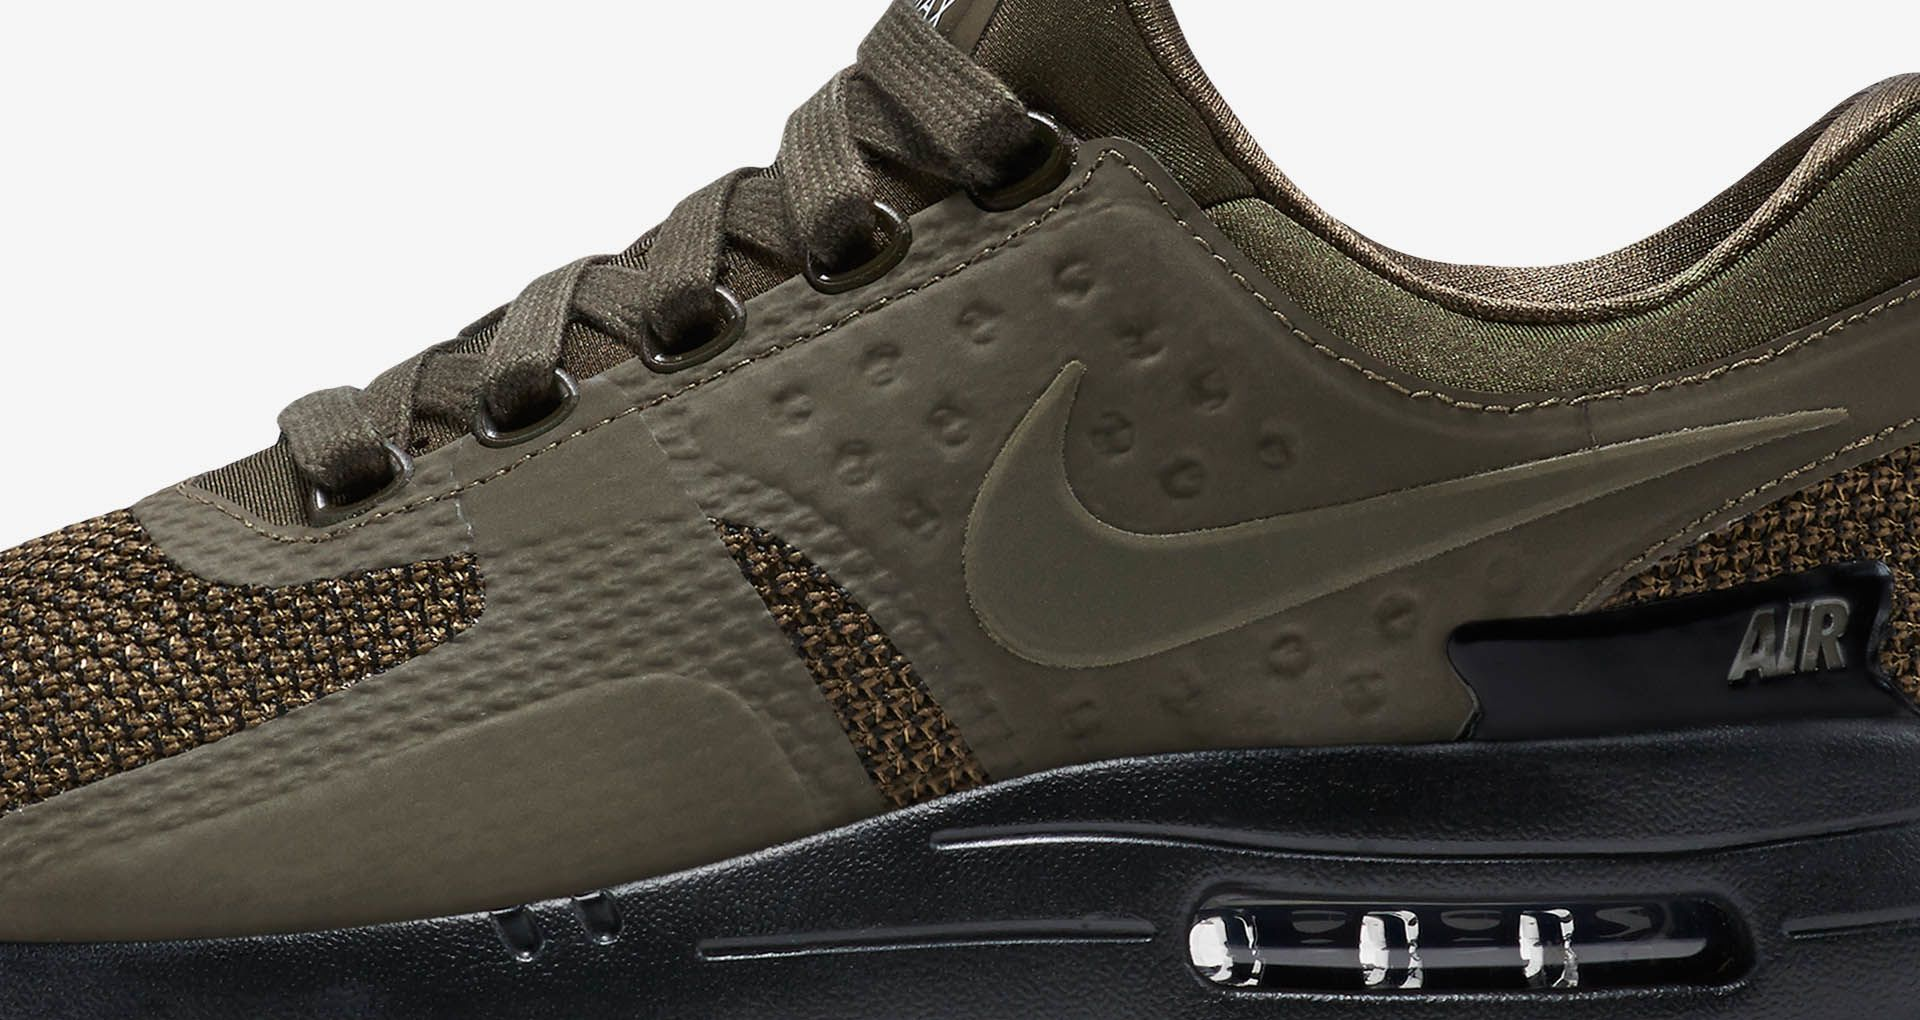 Nike Air Max Zero Premium 'Dark Loden'. Nike SNKRS